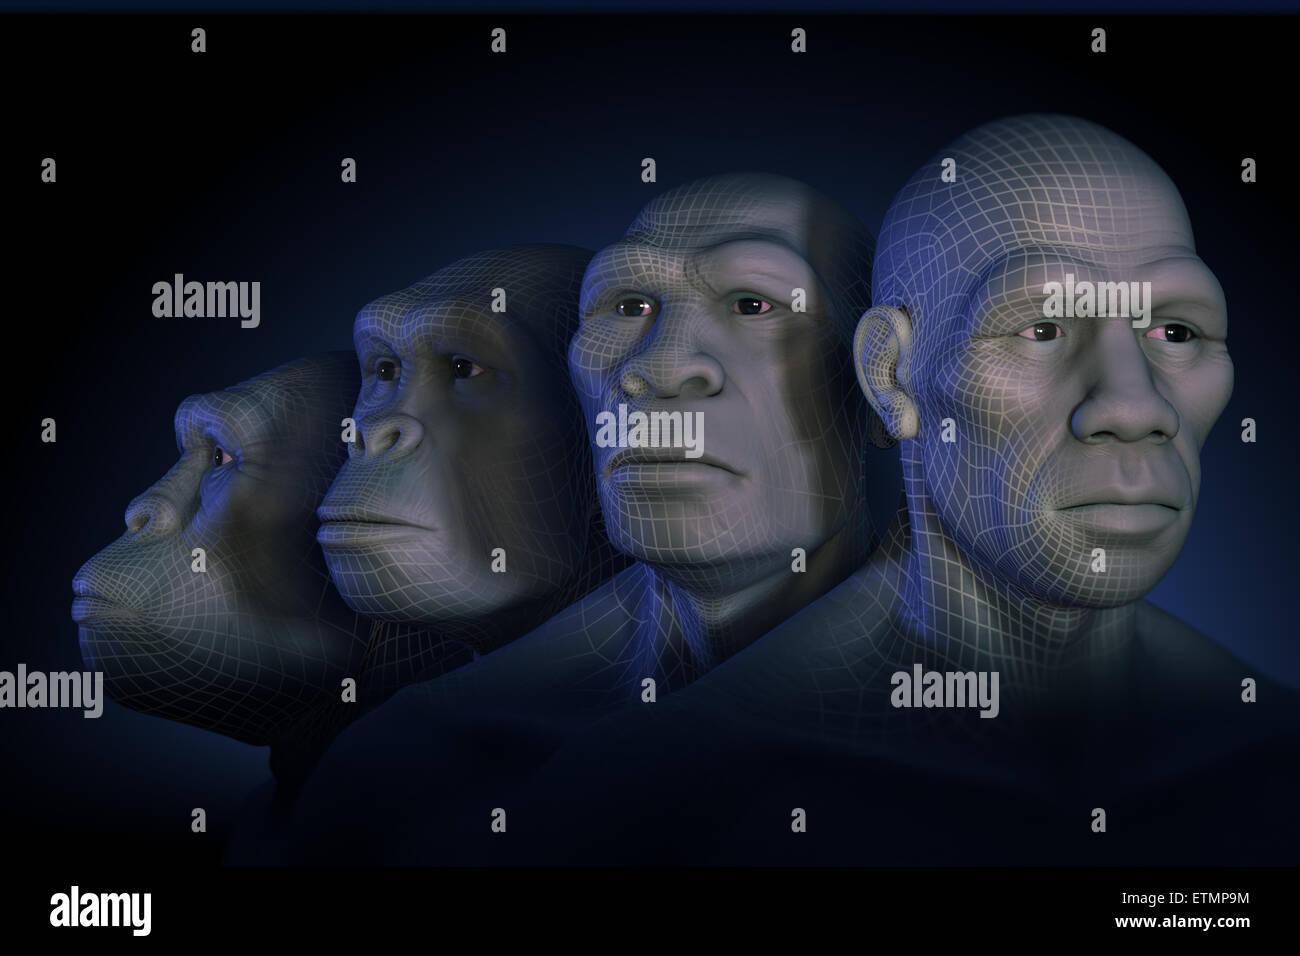 Conceptual image showing four stages of human evolution; Australopithecus, Homo Habilis, Homo Erectus and Homo Sapiens. - Stock Image